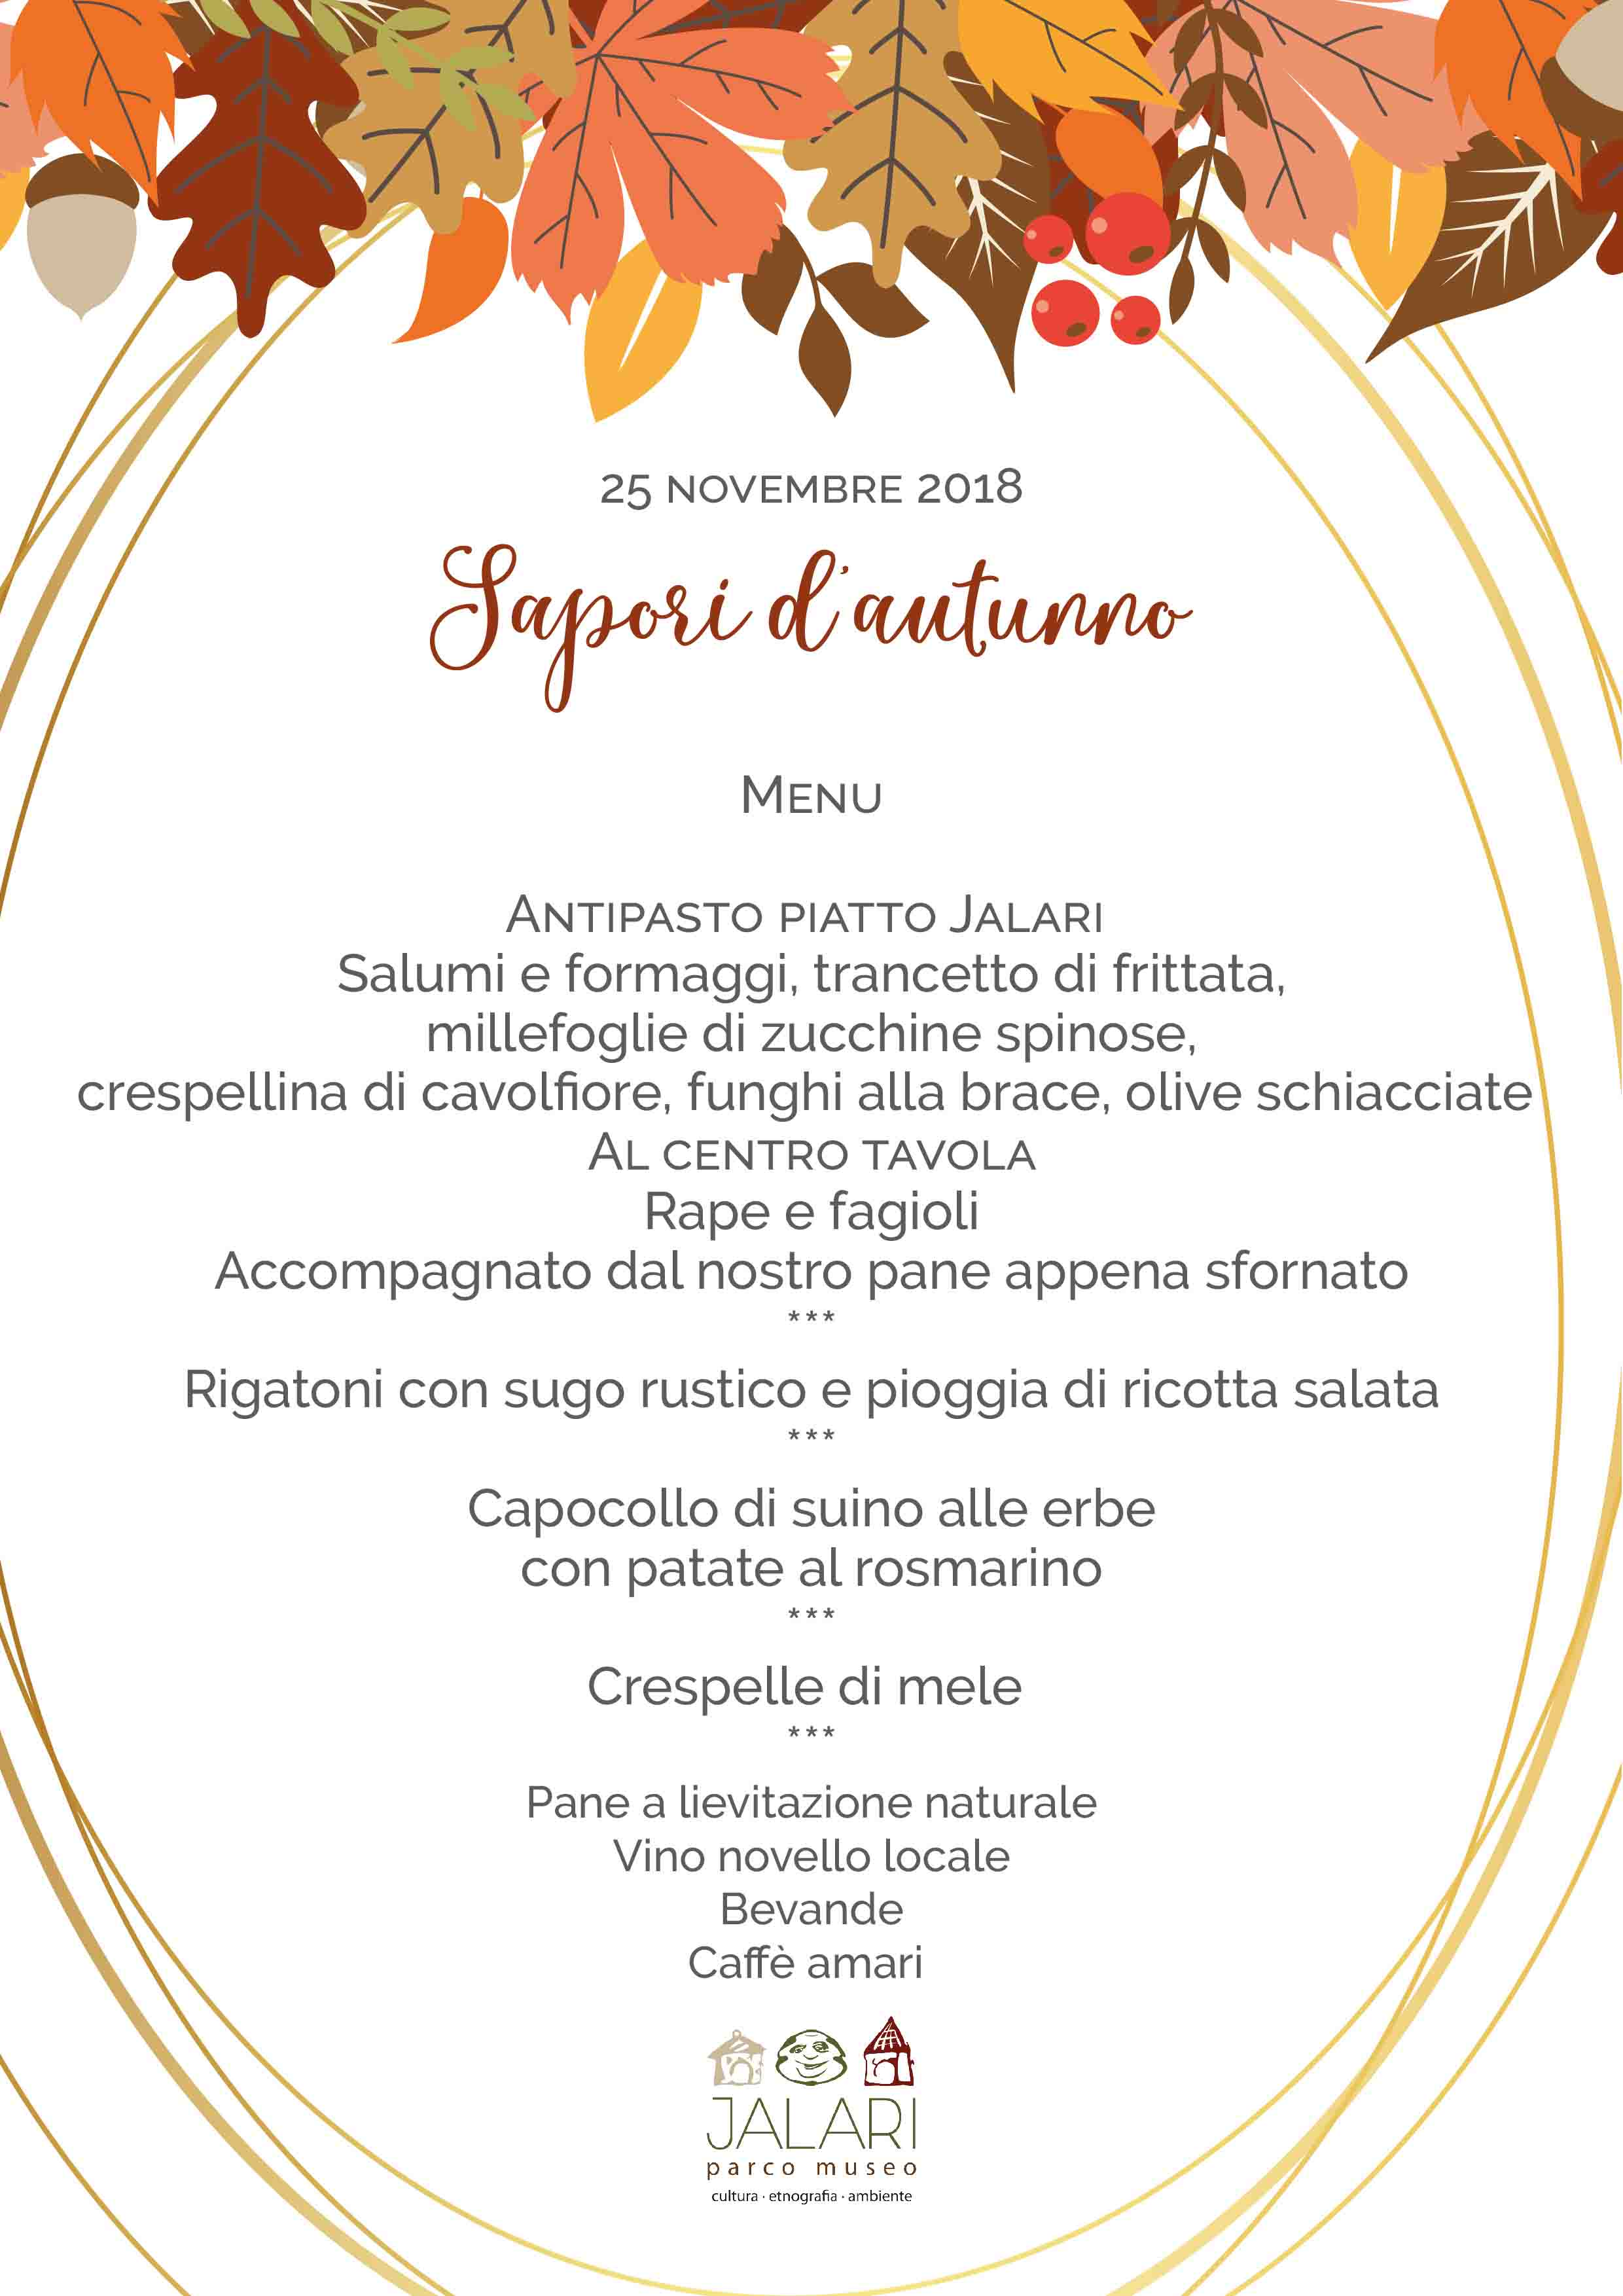 domenica pranzo in agriturismo al Parco Museo Jalari